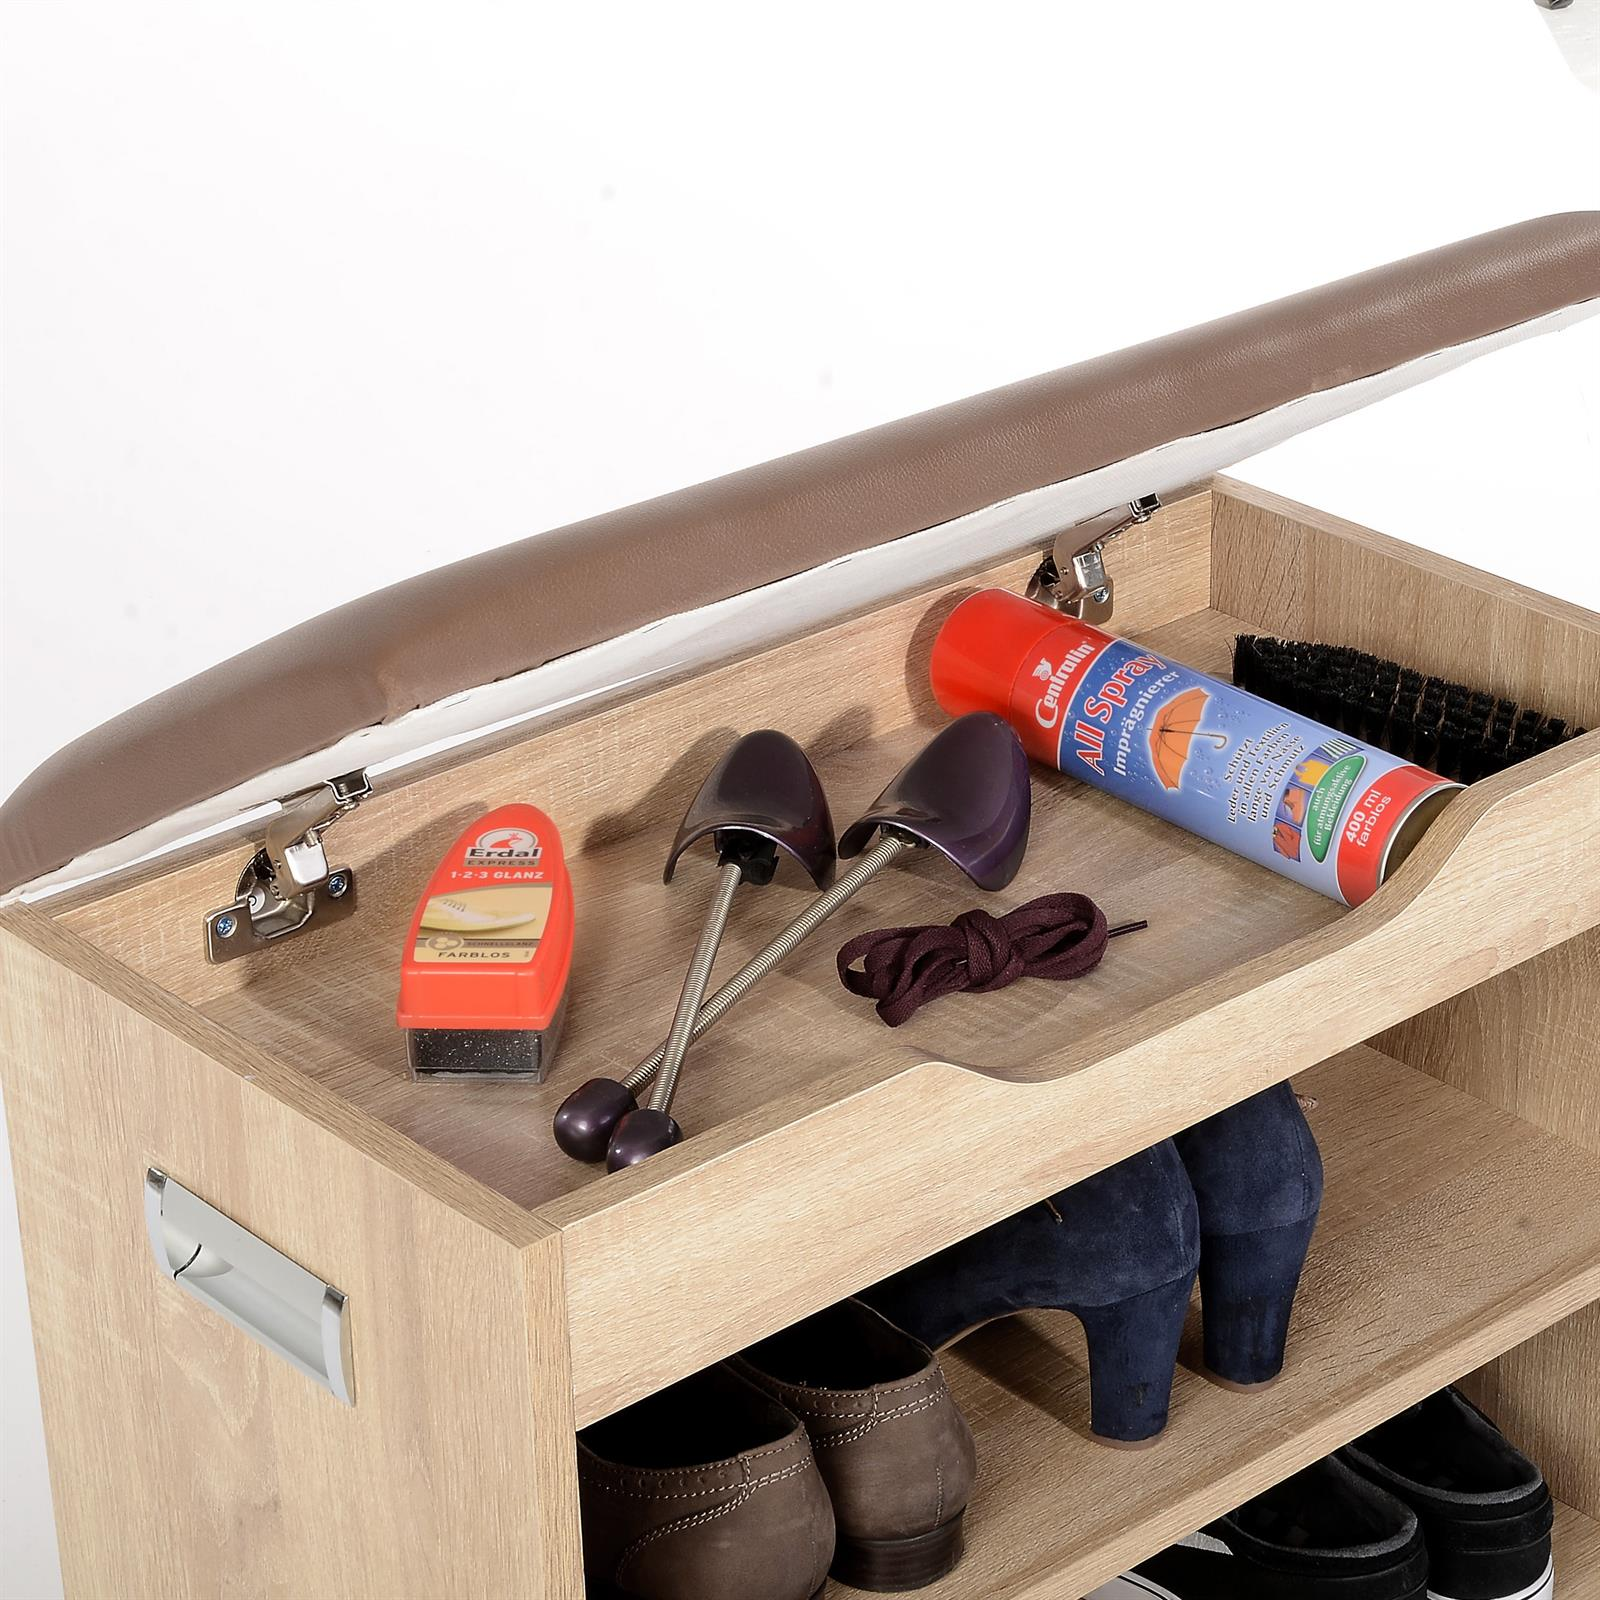 schuhbank sitzbank truhe schuhregal mit kissen 6 paar. Black Bedroom Furniture Sets. Home Design Ideas